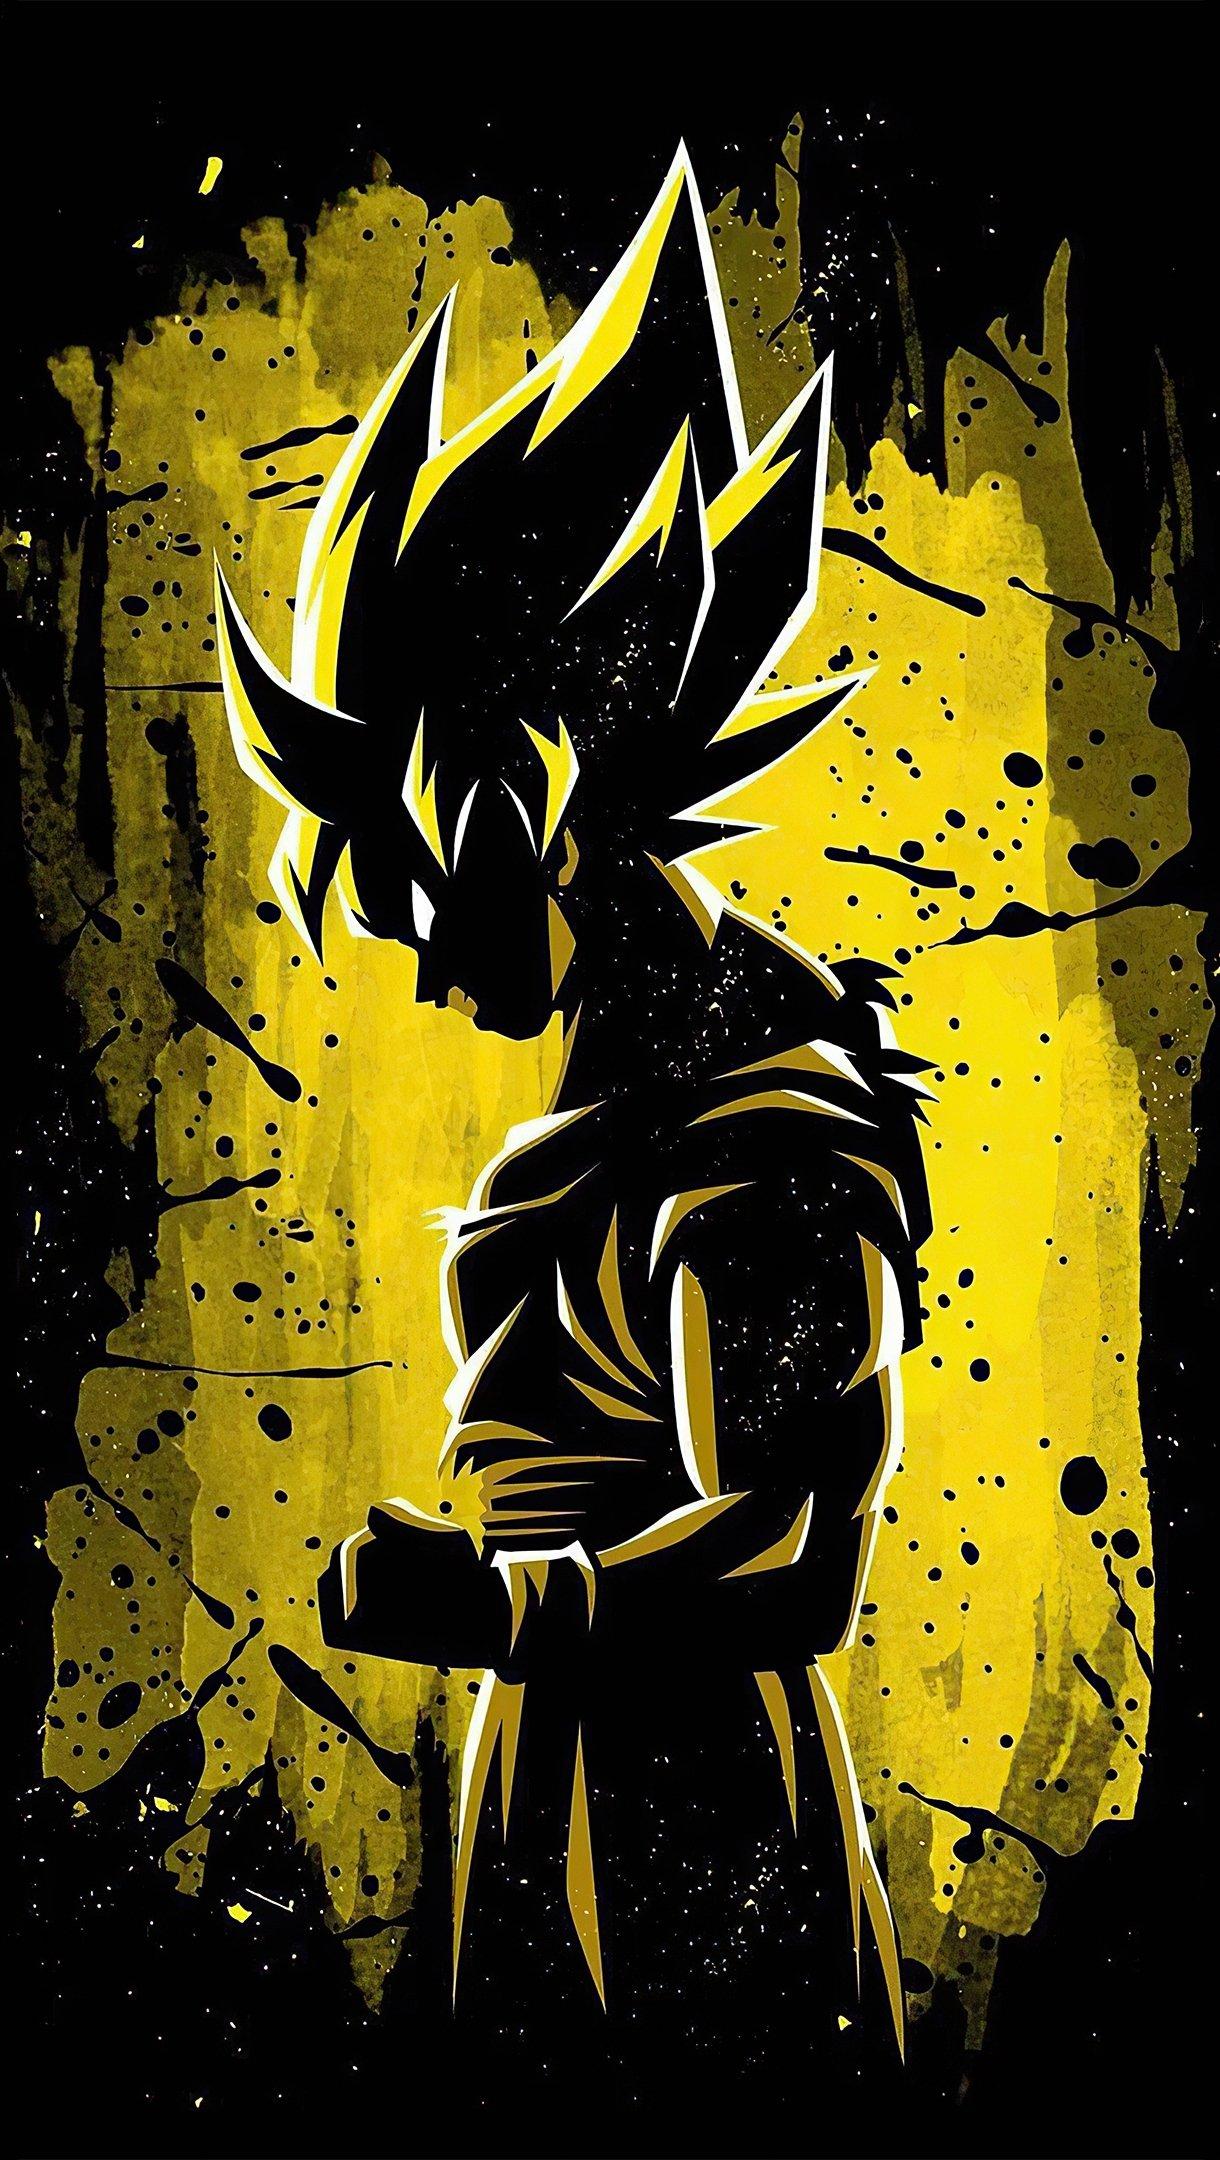 Anime Wallpaper Goku Minimalist illustration Vertical